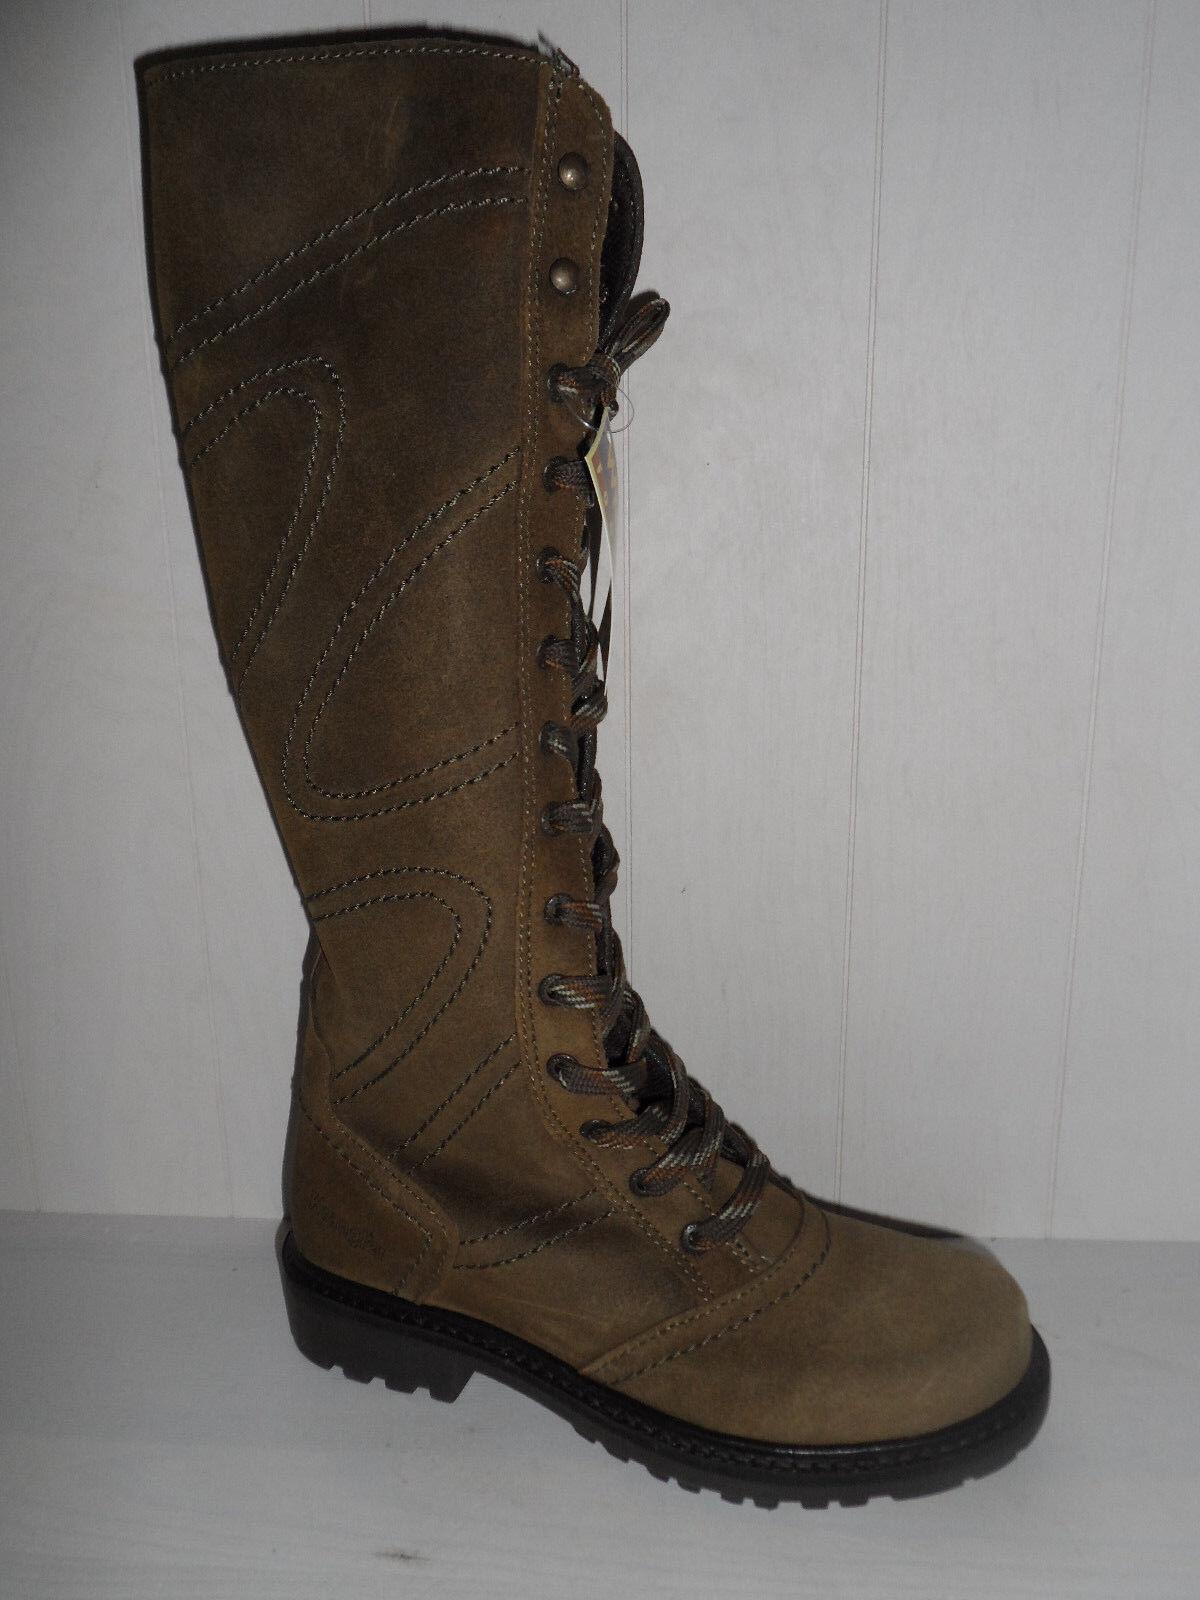 Wrangler Scando High Leg Khaki Suede Army Stiefel Veloursleder  99,95 NEU